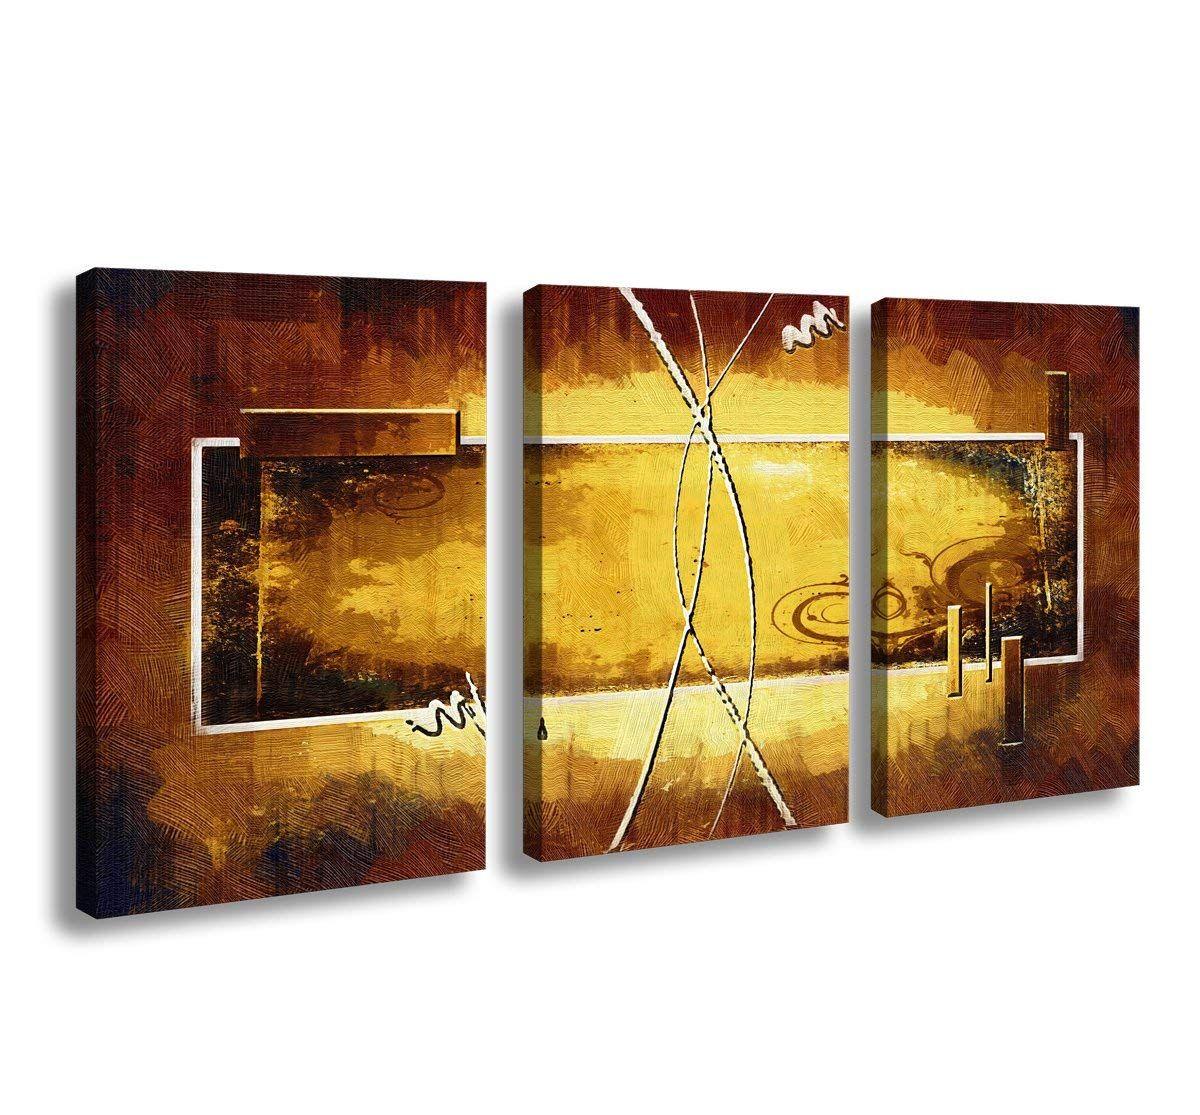 Cao Gen Decor Art-A01146 3 panels Framed Wall Art Canvas Prints ...